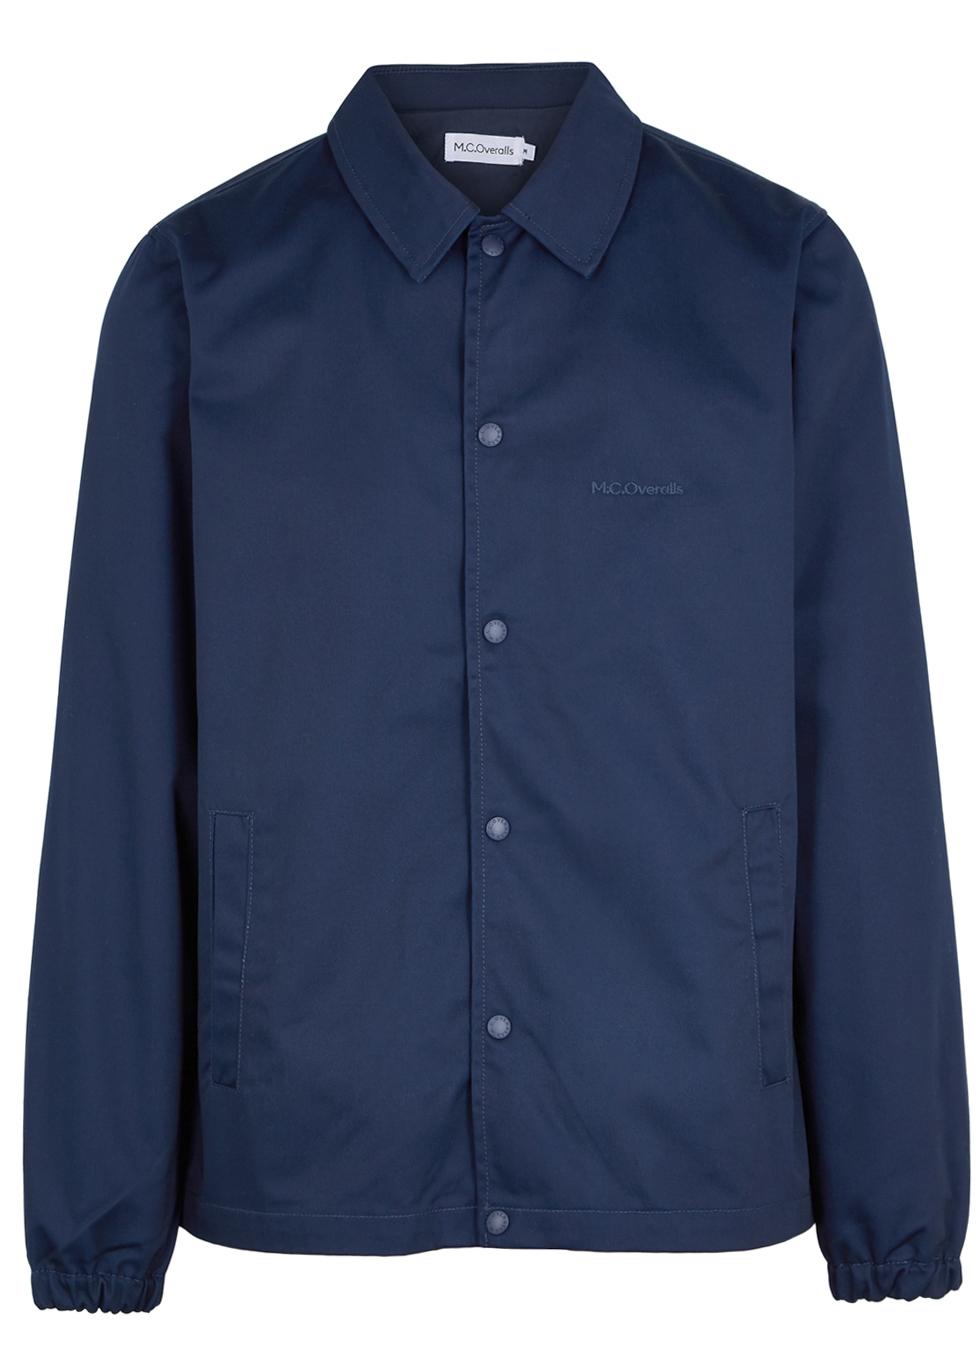 M.C. OVERALLS Navy Twill Jacket